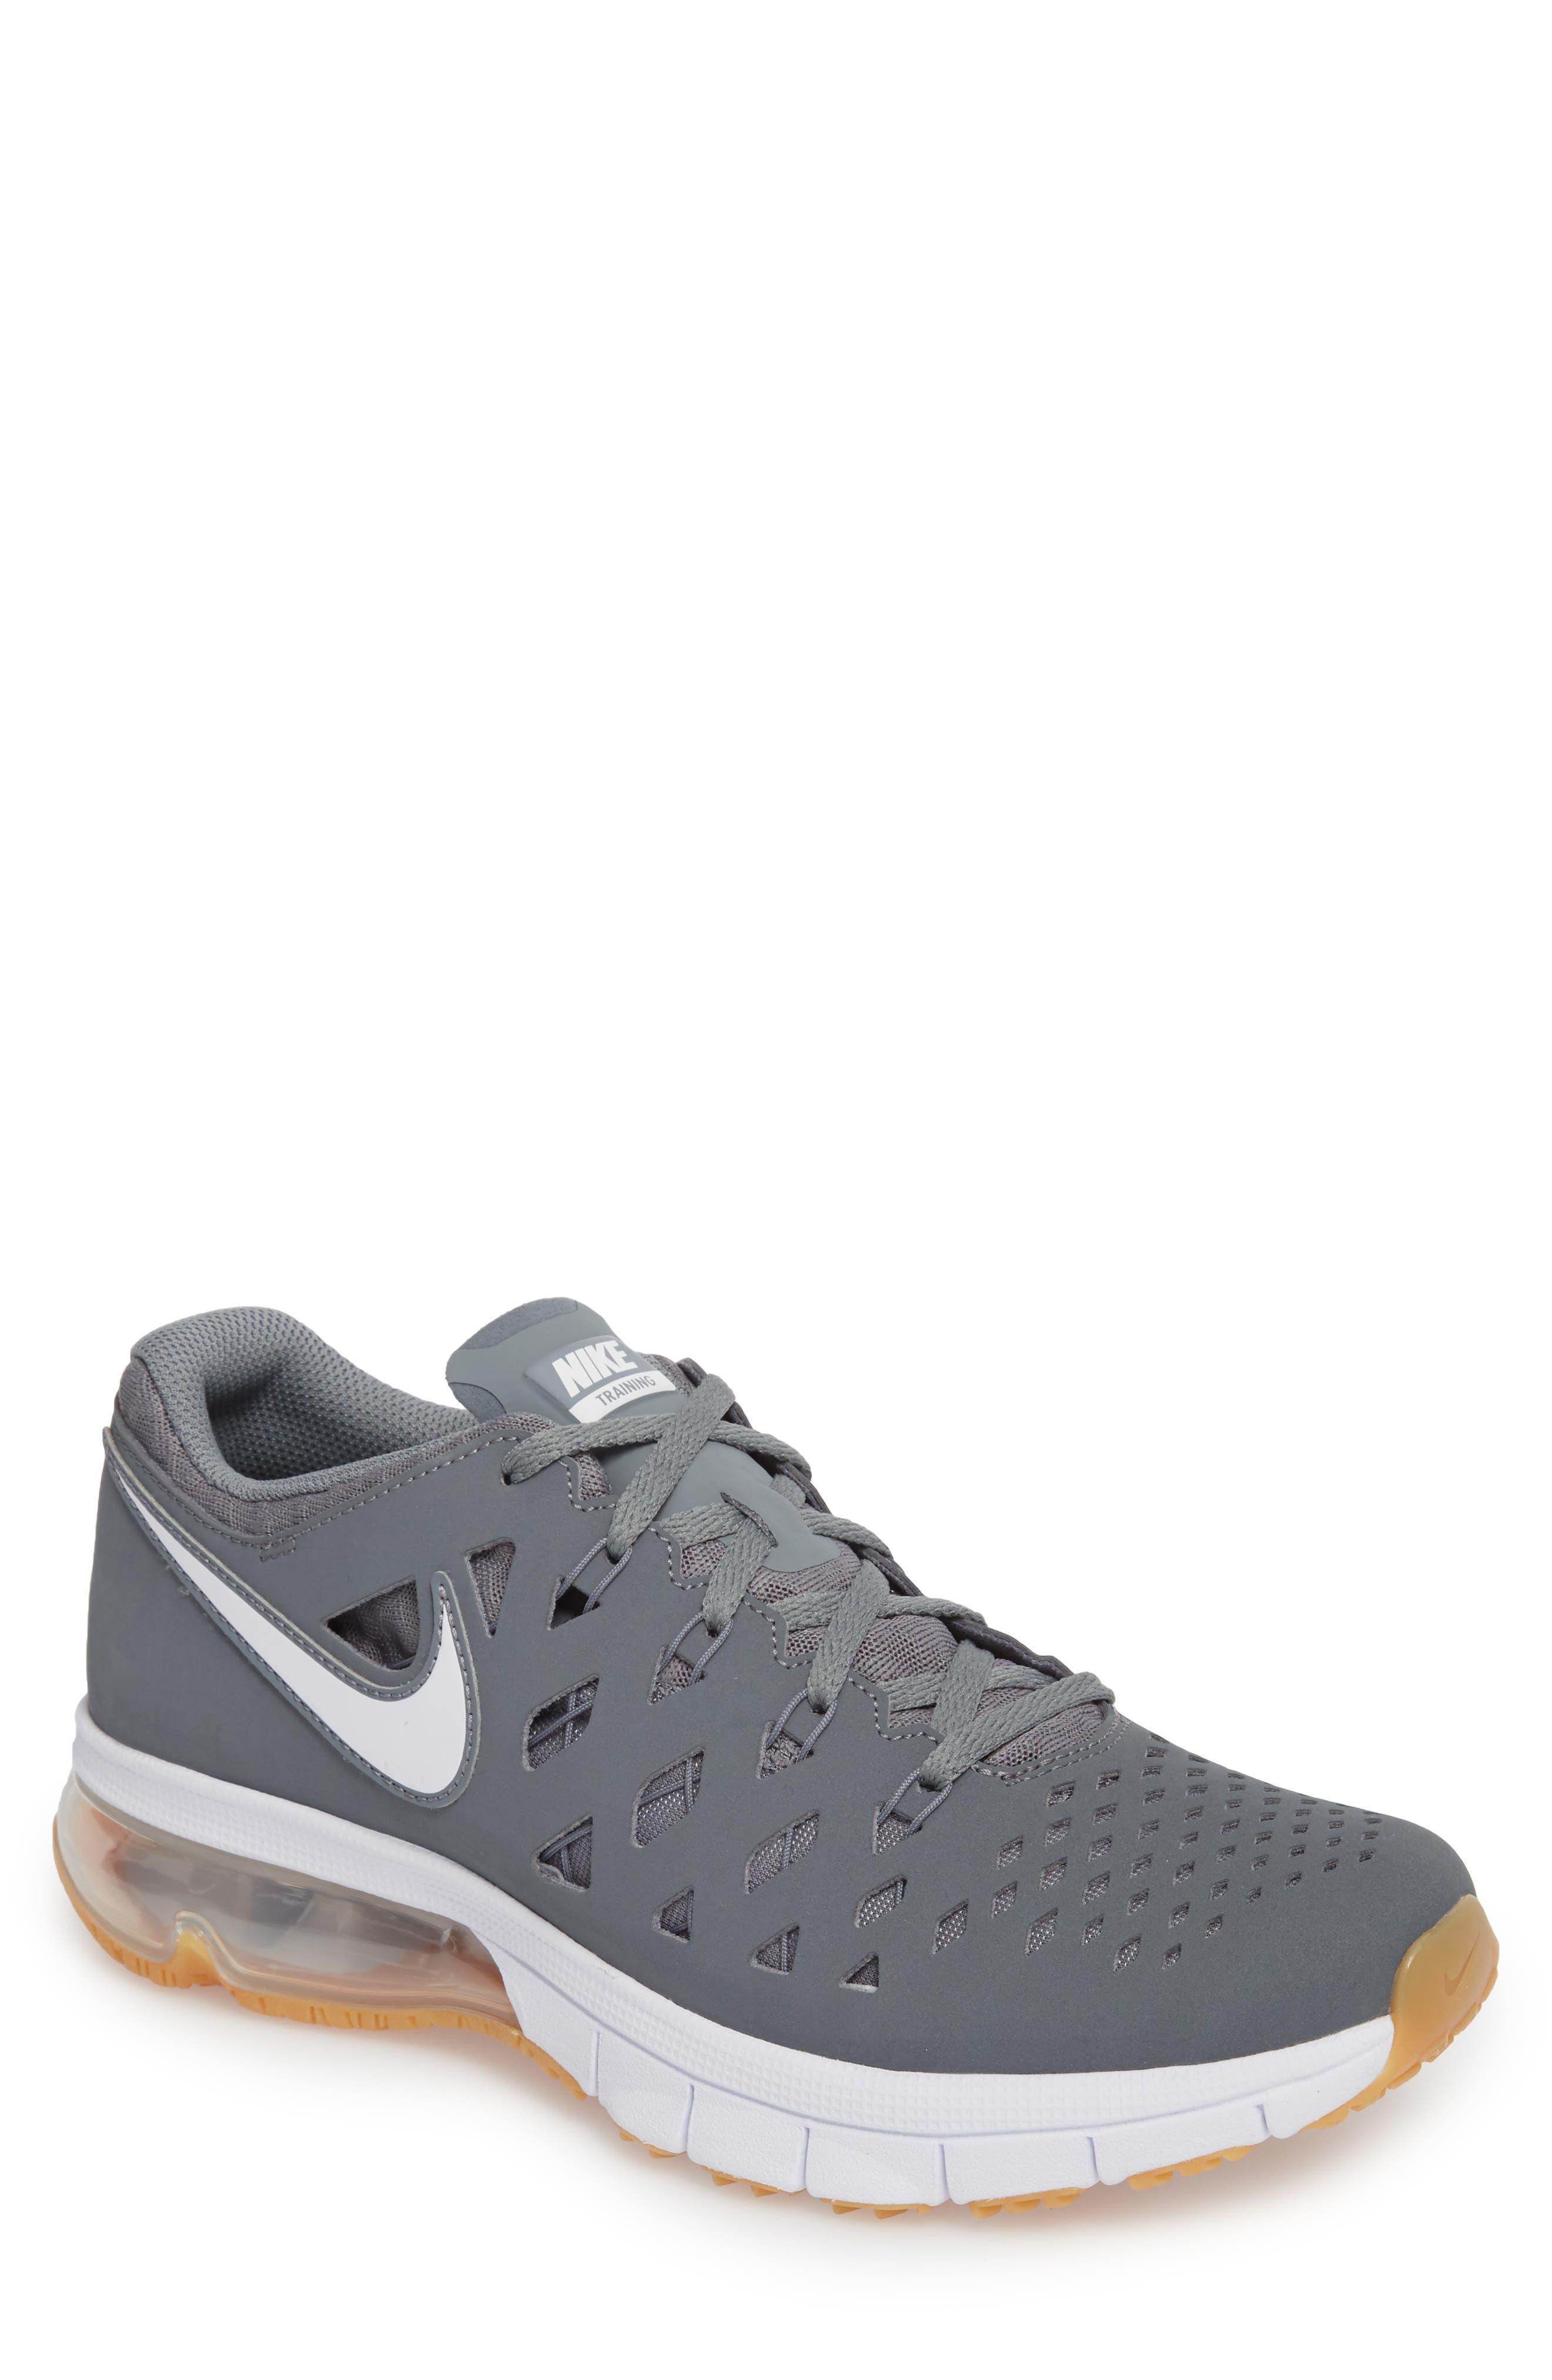 Alternate Image 1 Selected - Nike Air Trainer 180 Training Shoe (Men)